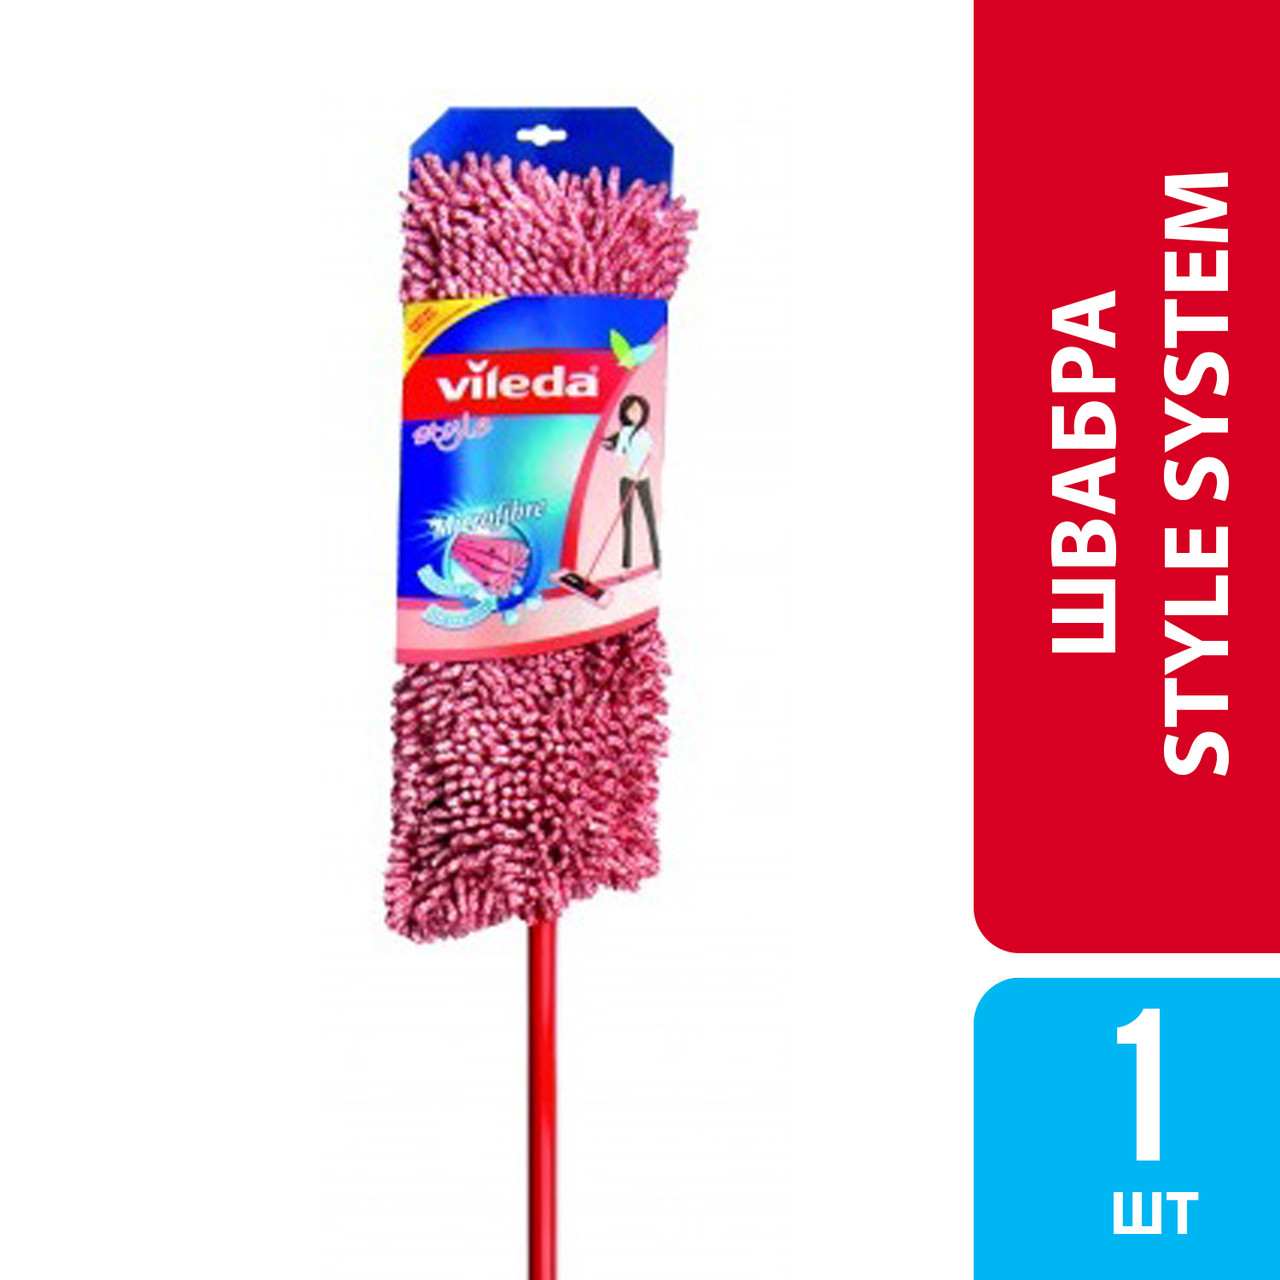 Швабра для ламината Style System (Шениль), Vileda, 1 шт.